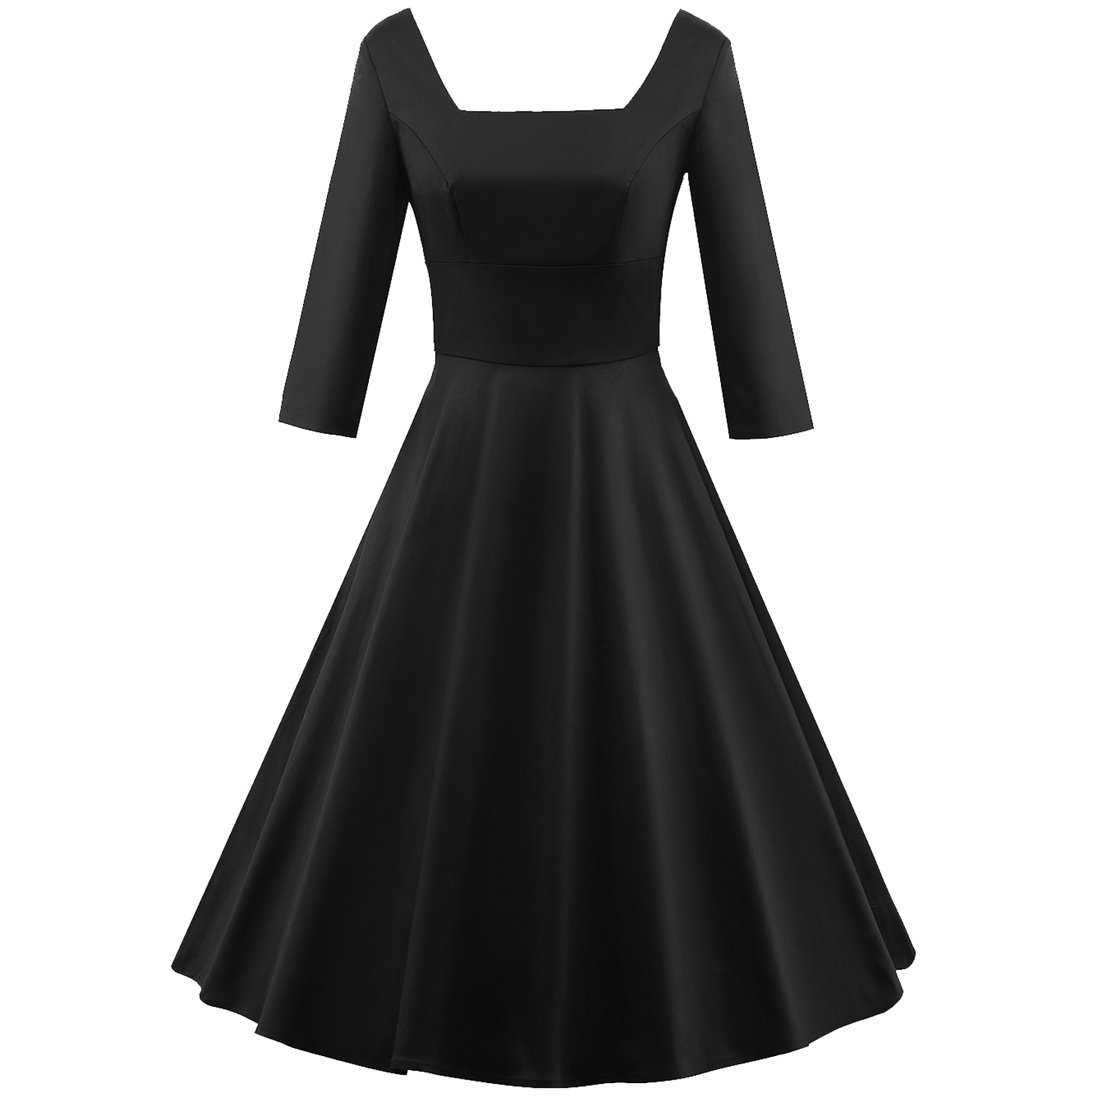 565eaec199f Amazon.com  Shengdilu Women s Vintage Retro Ball Gown 1940s Flared Dress  Swing Skaters  Clothing